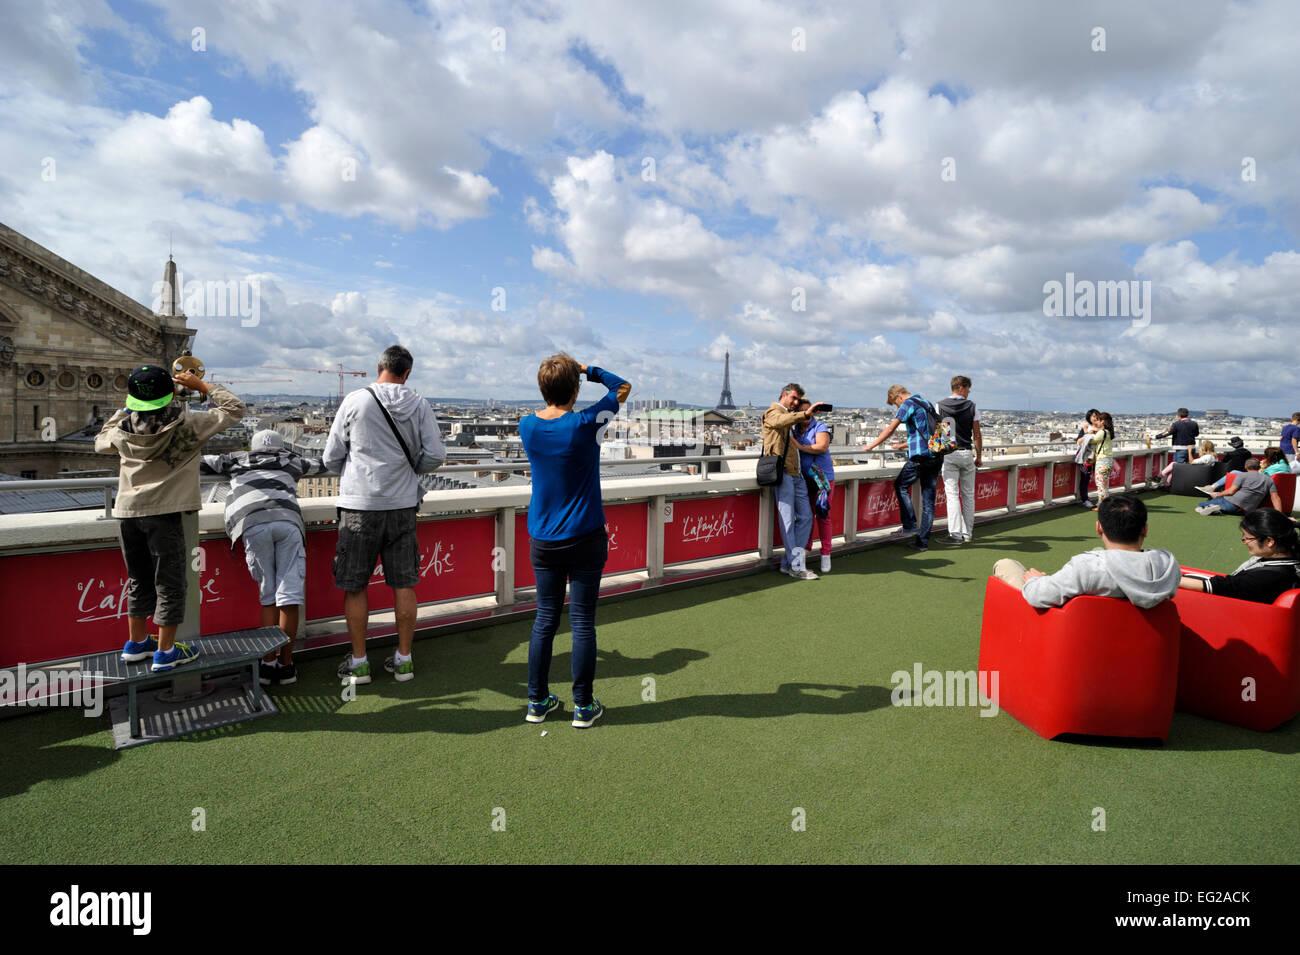 paris, galeries lafayette, roof garden - Stock Image